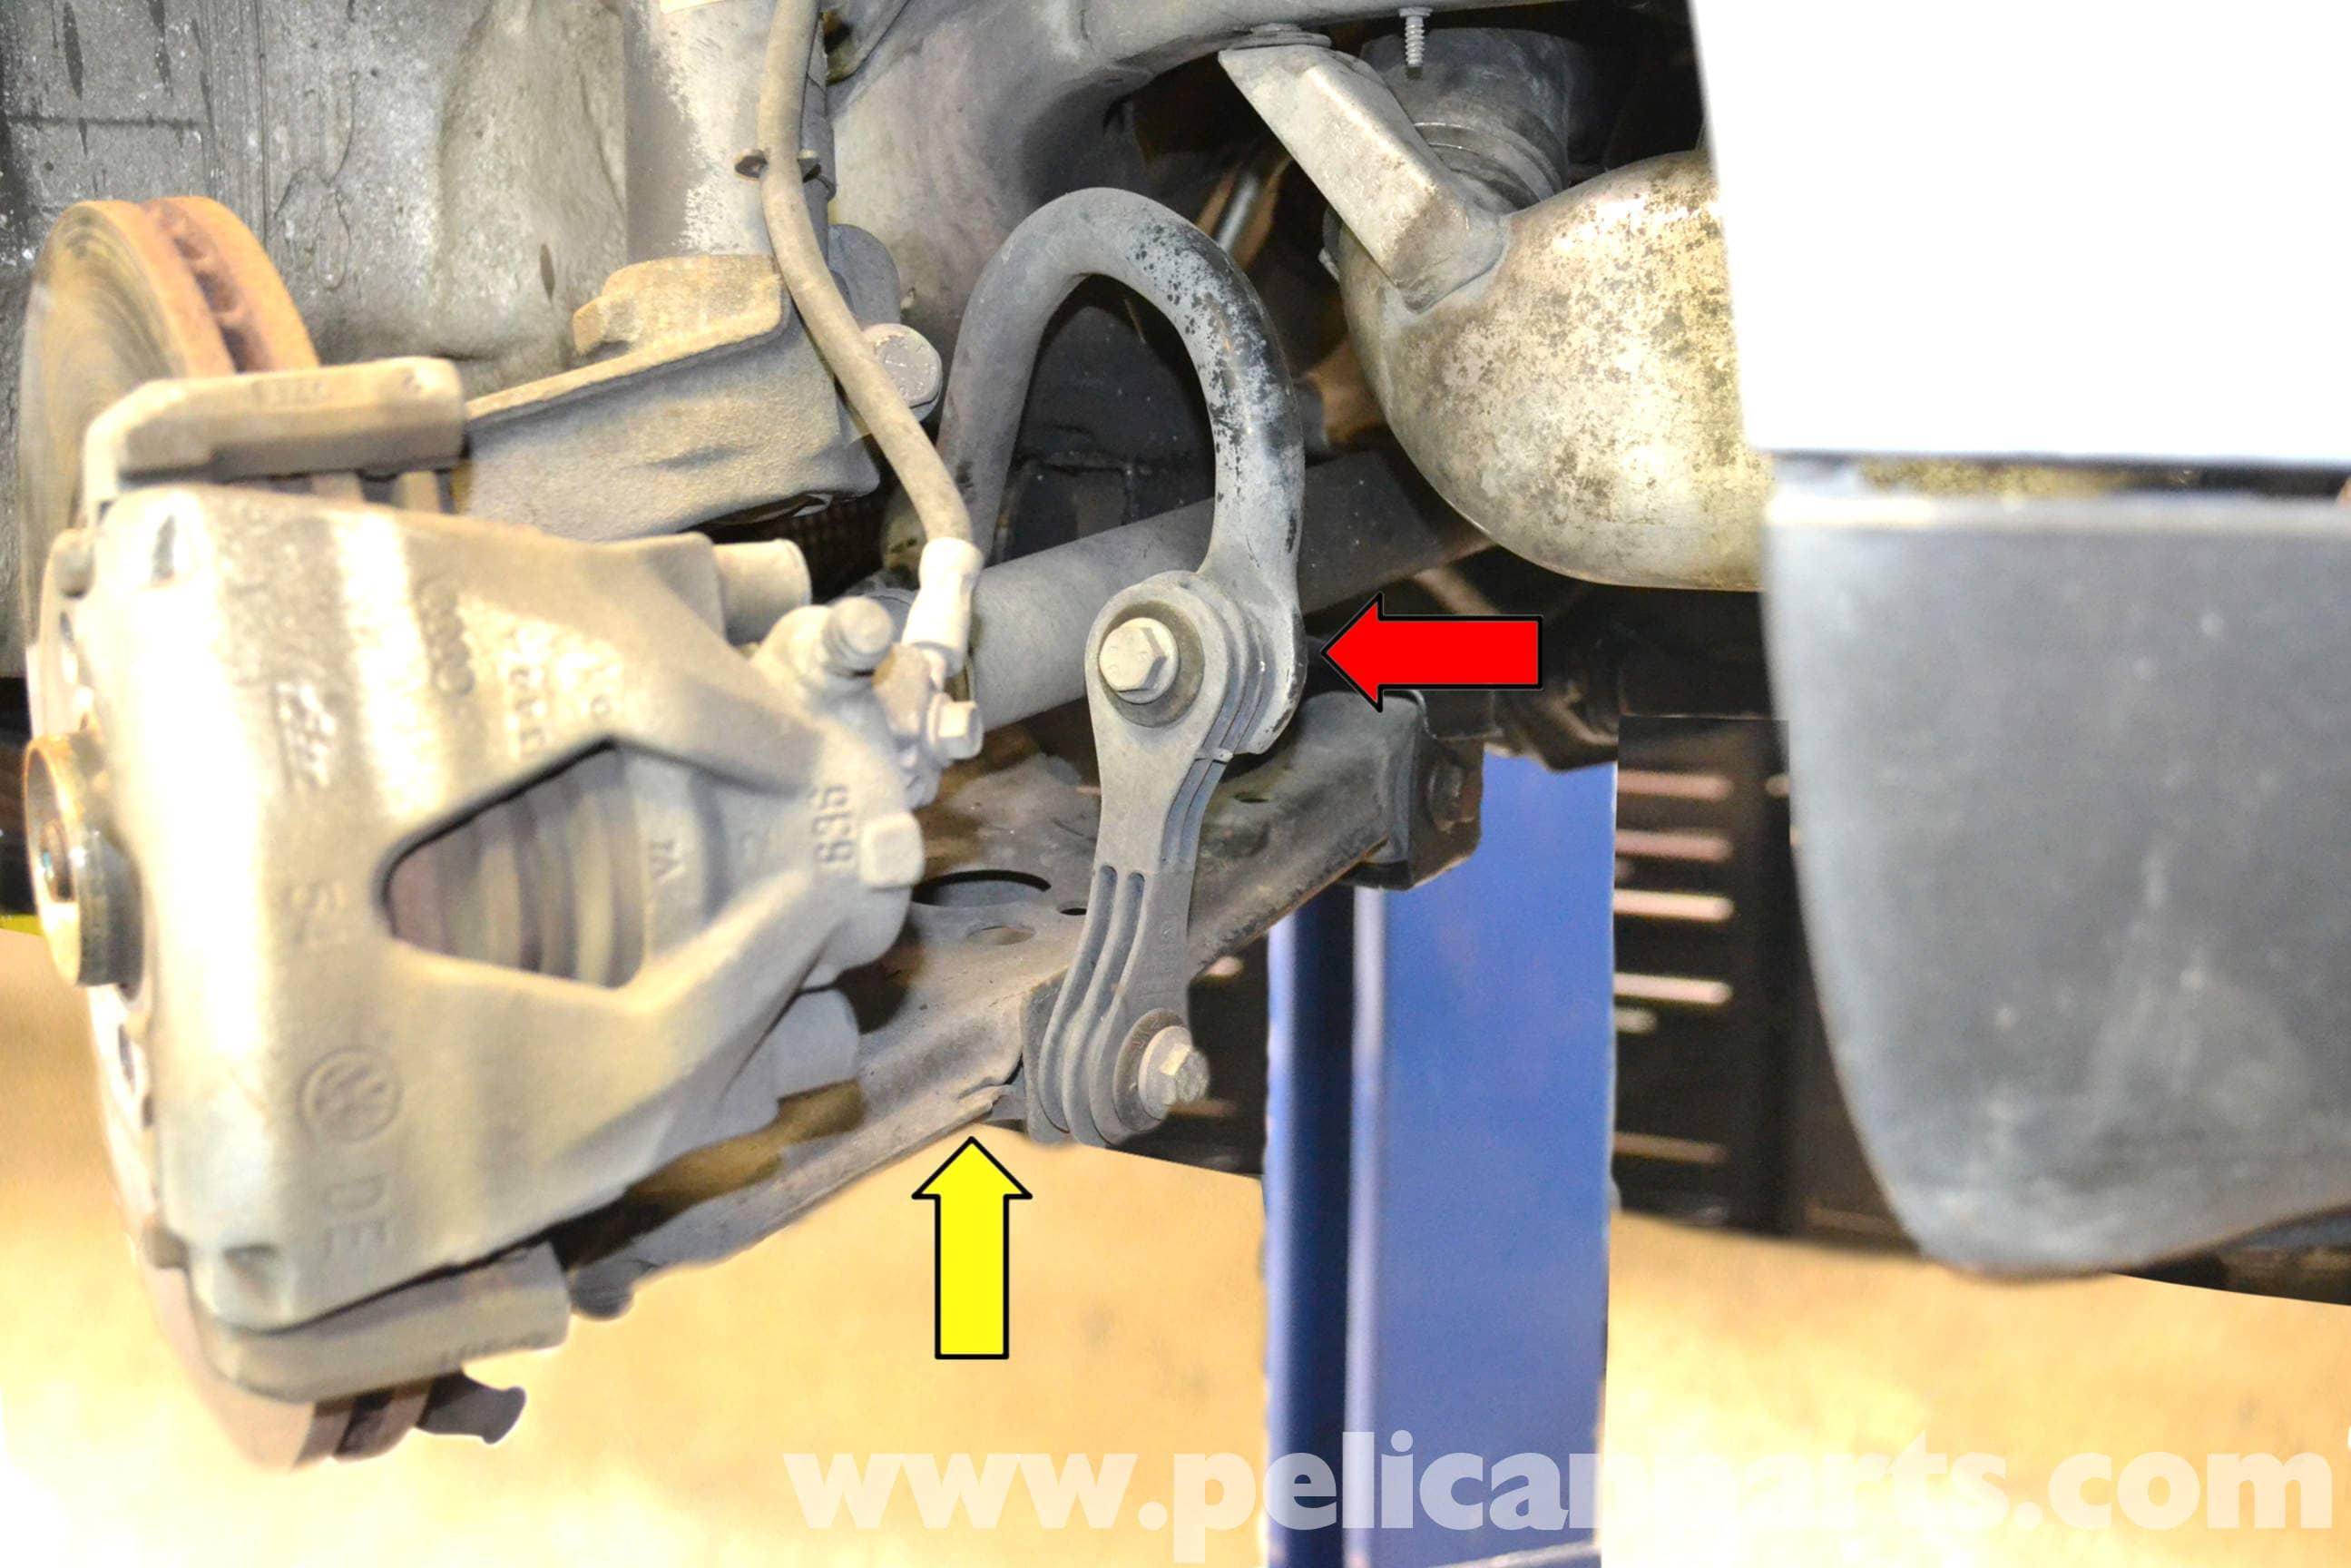 Volkswagen Golf GTI Mk IV Front Sway Bar Bushing Replacement (1999-2005) - Pelican Parts DIY ...